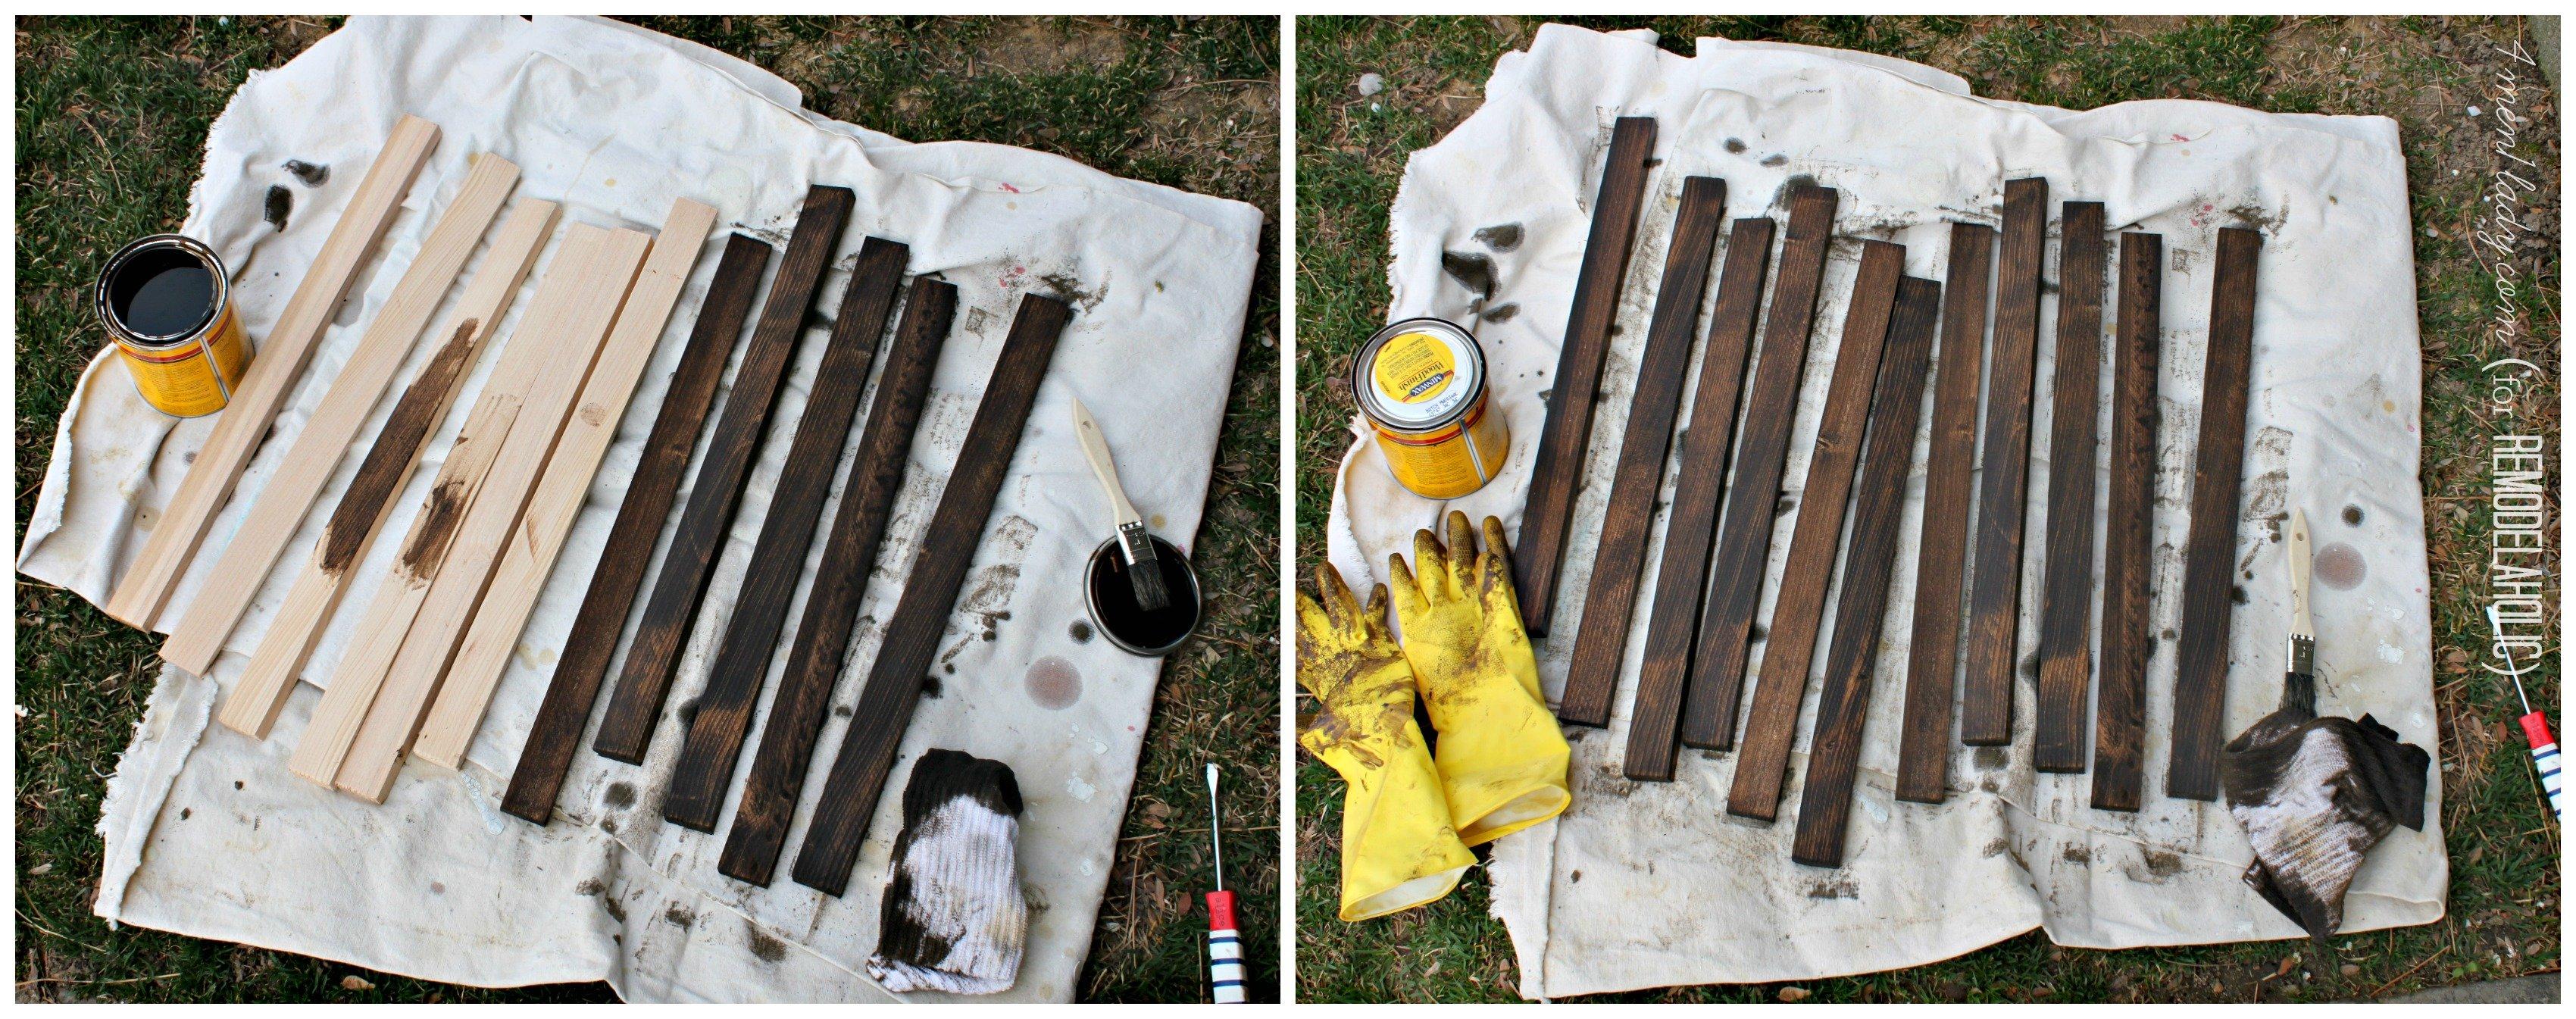 Remodelaholic | DIY Wood Stake Door Mat